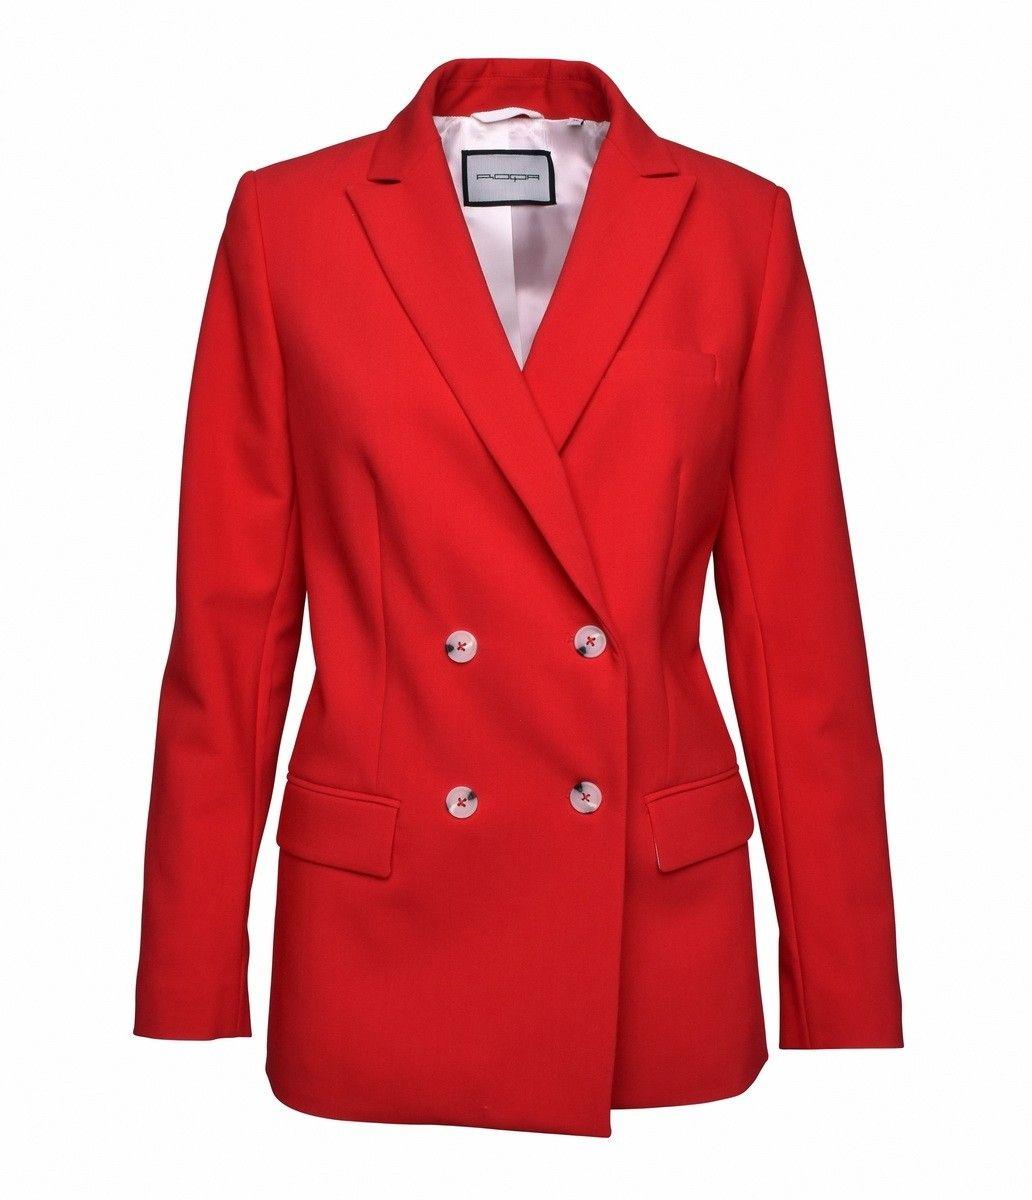 ROQA - Damen Blazer - Red